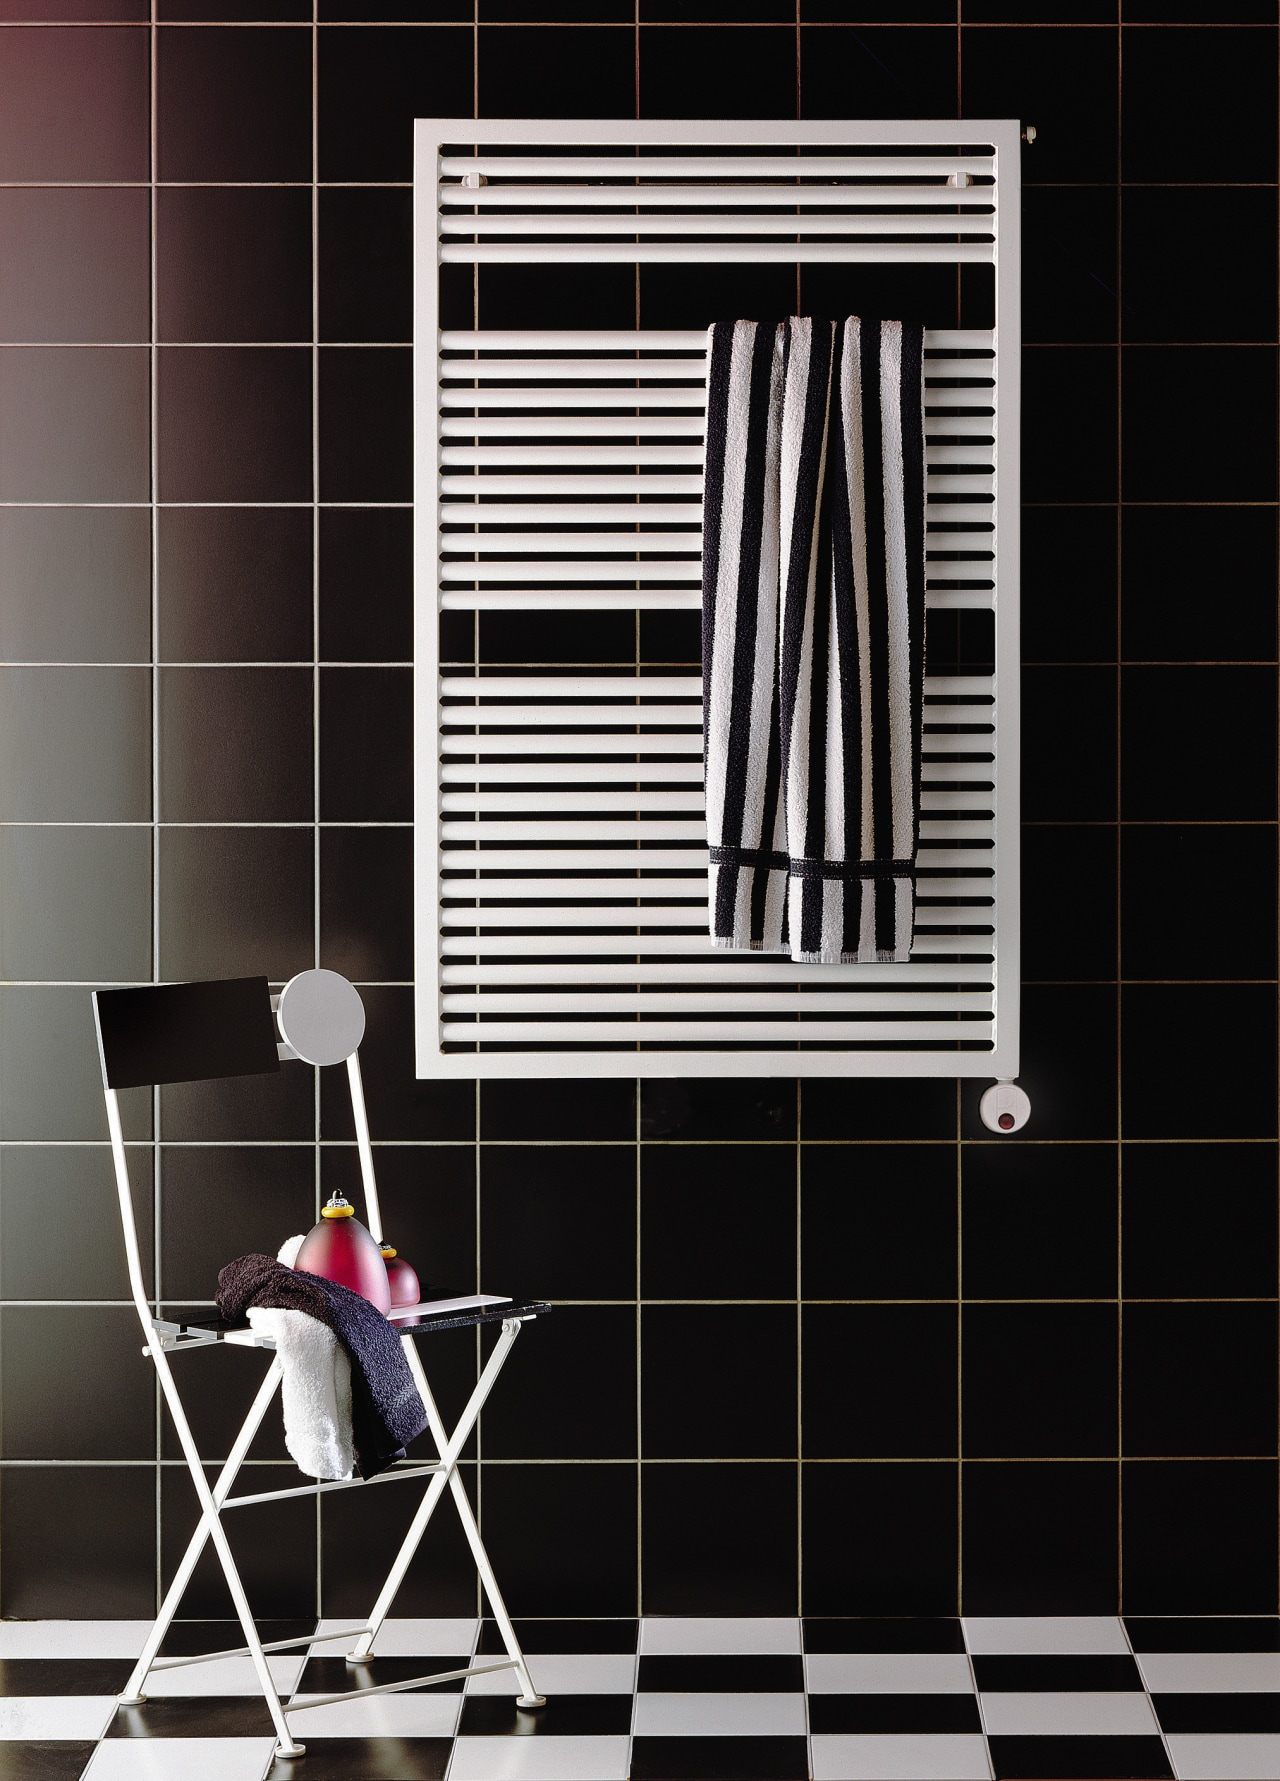 View of this bathroom accessory black, floor, flooring, furniture, interior design, line, product, shelf, shelving, tile, wall, window, black